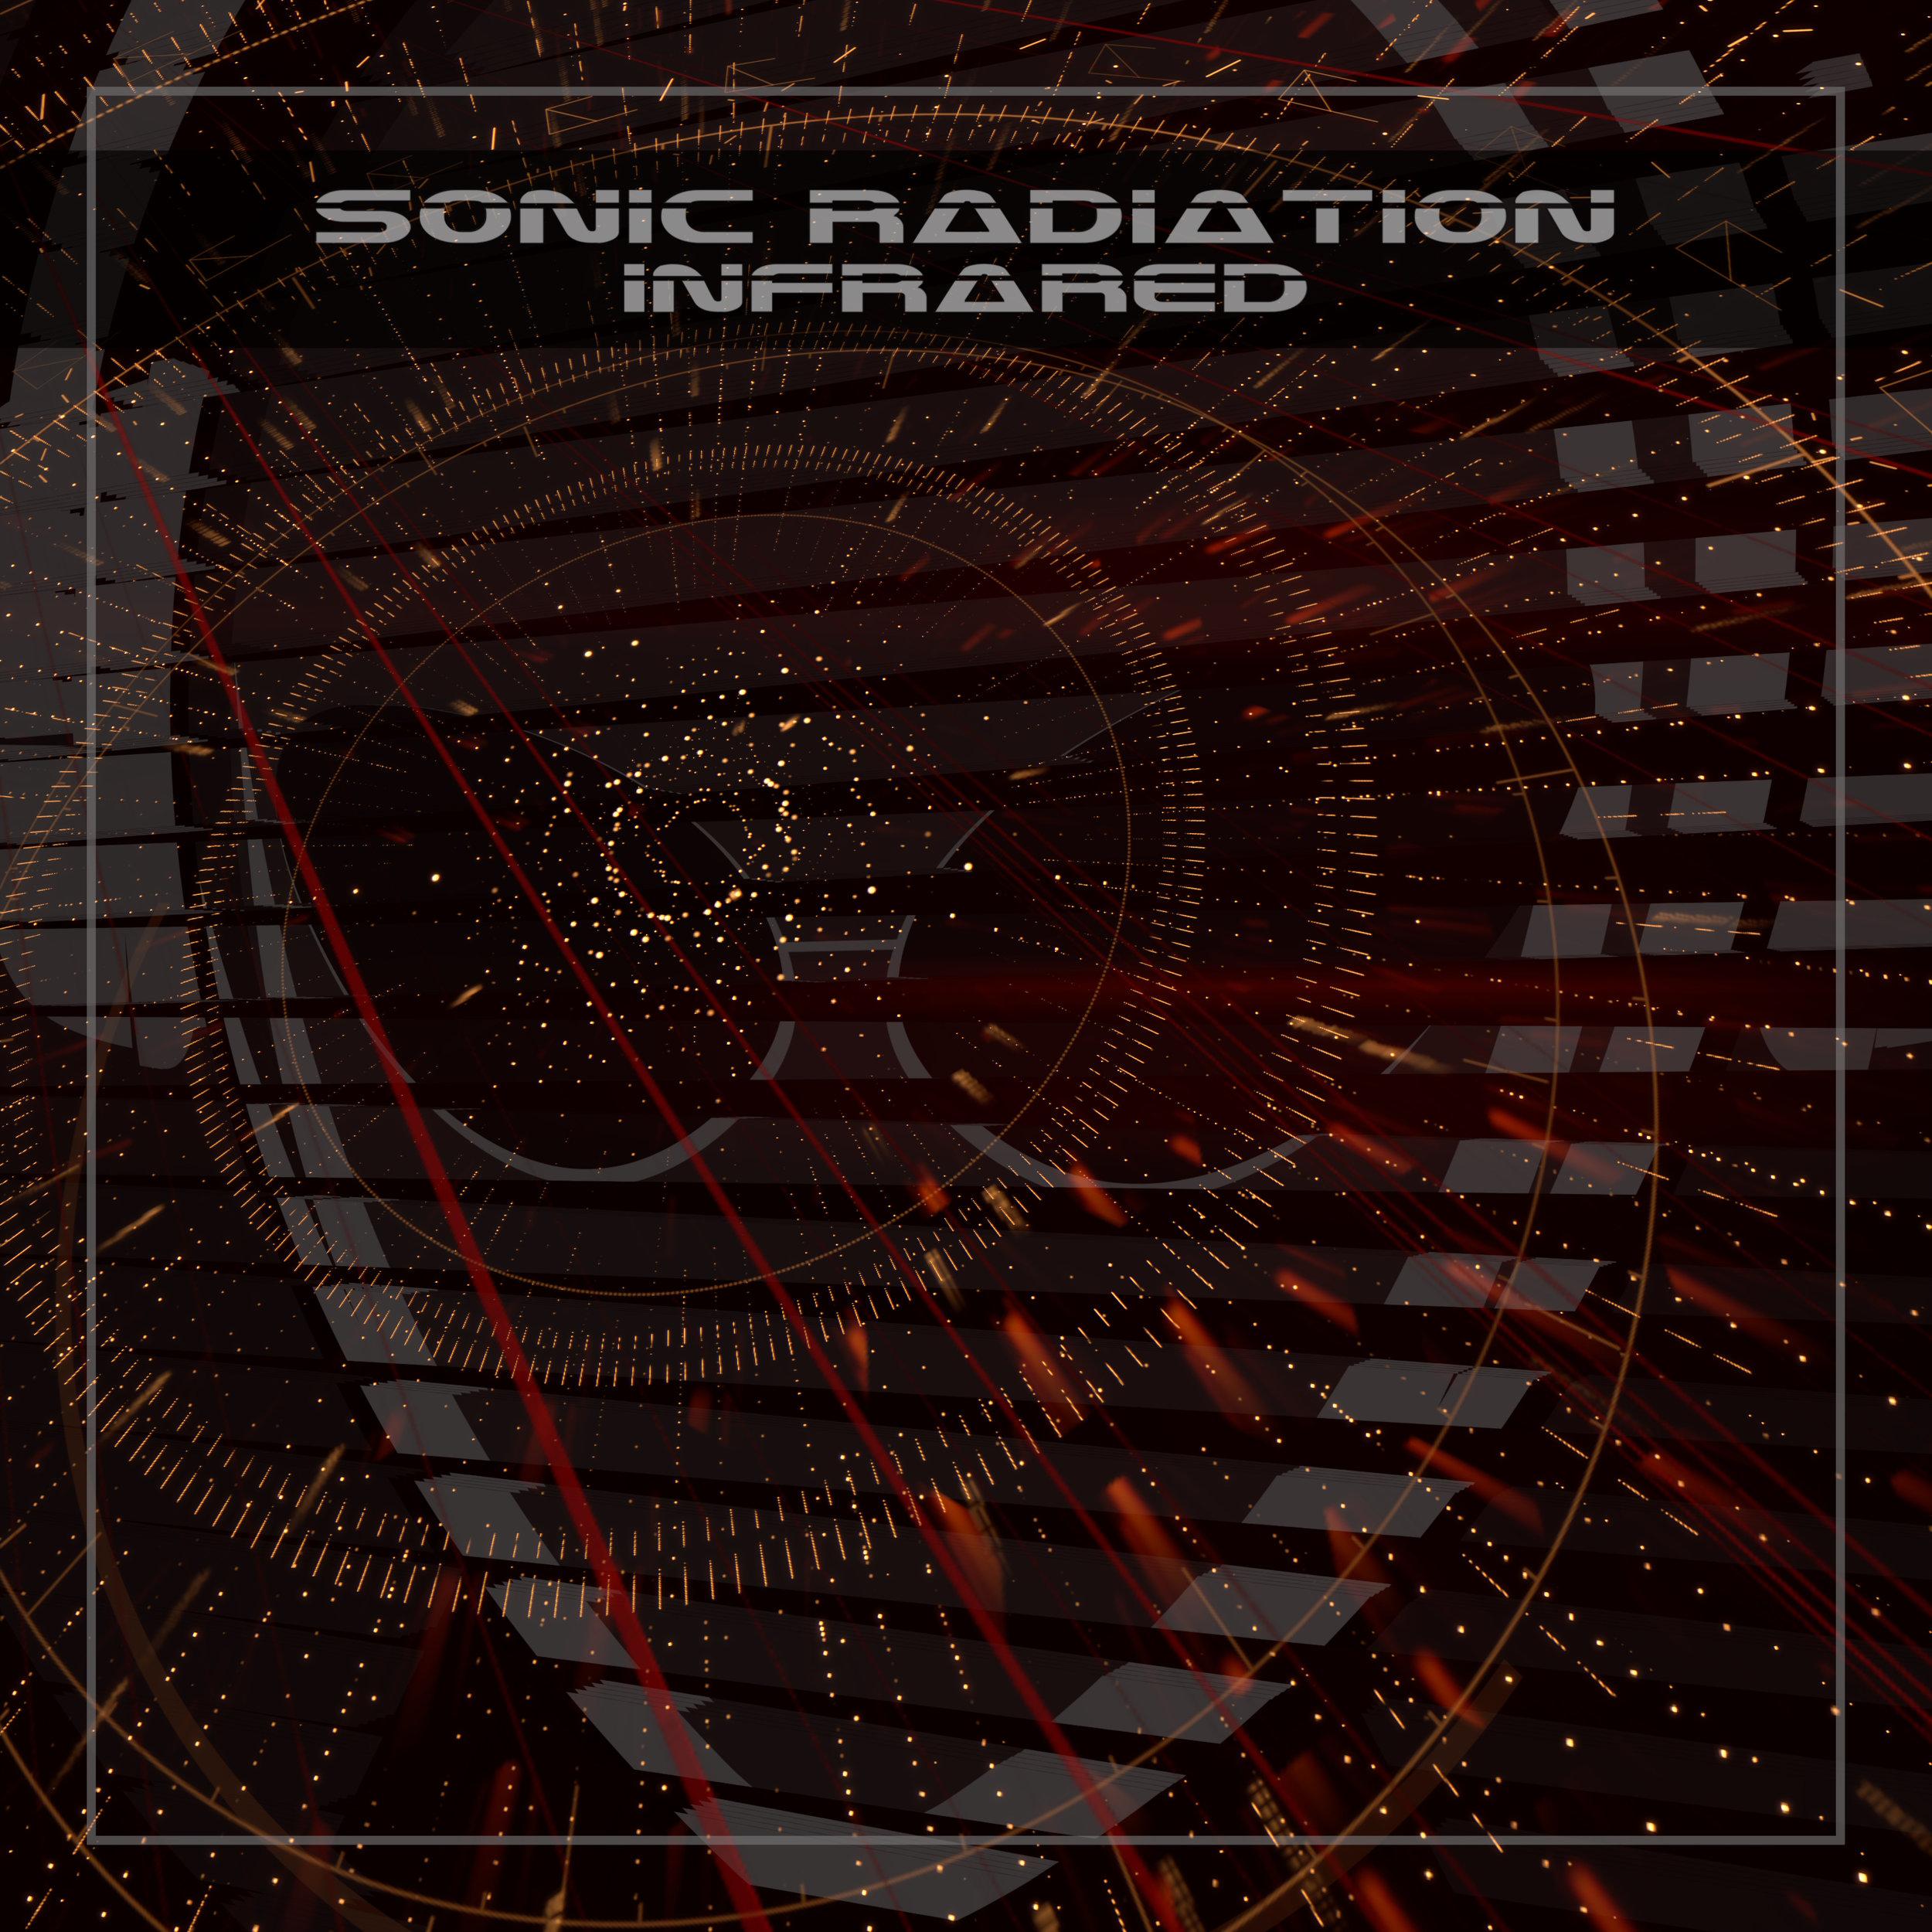 Sonic Radiation - Infrared3000x3000.jpg